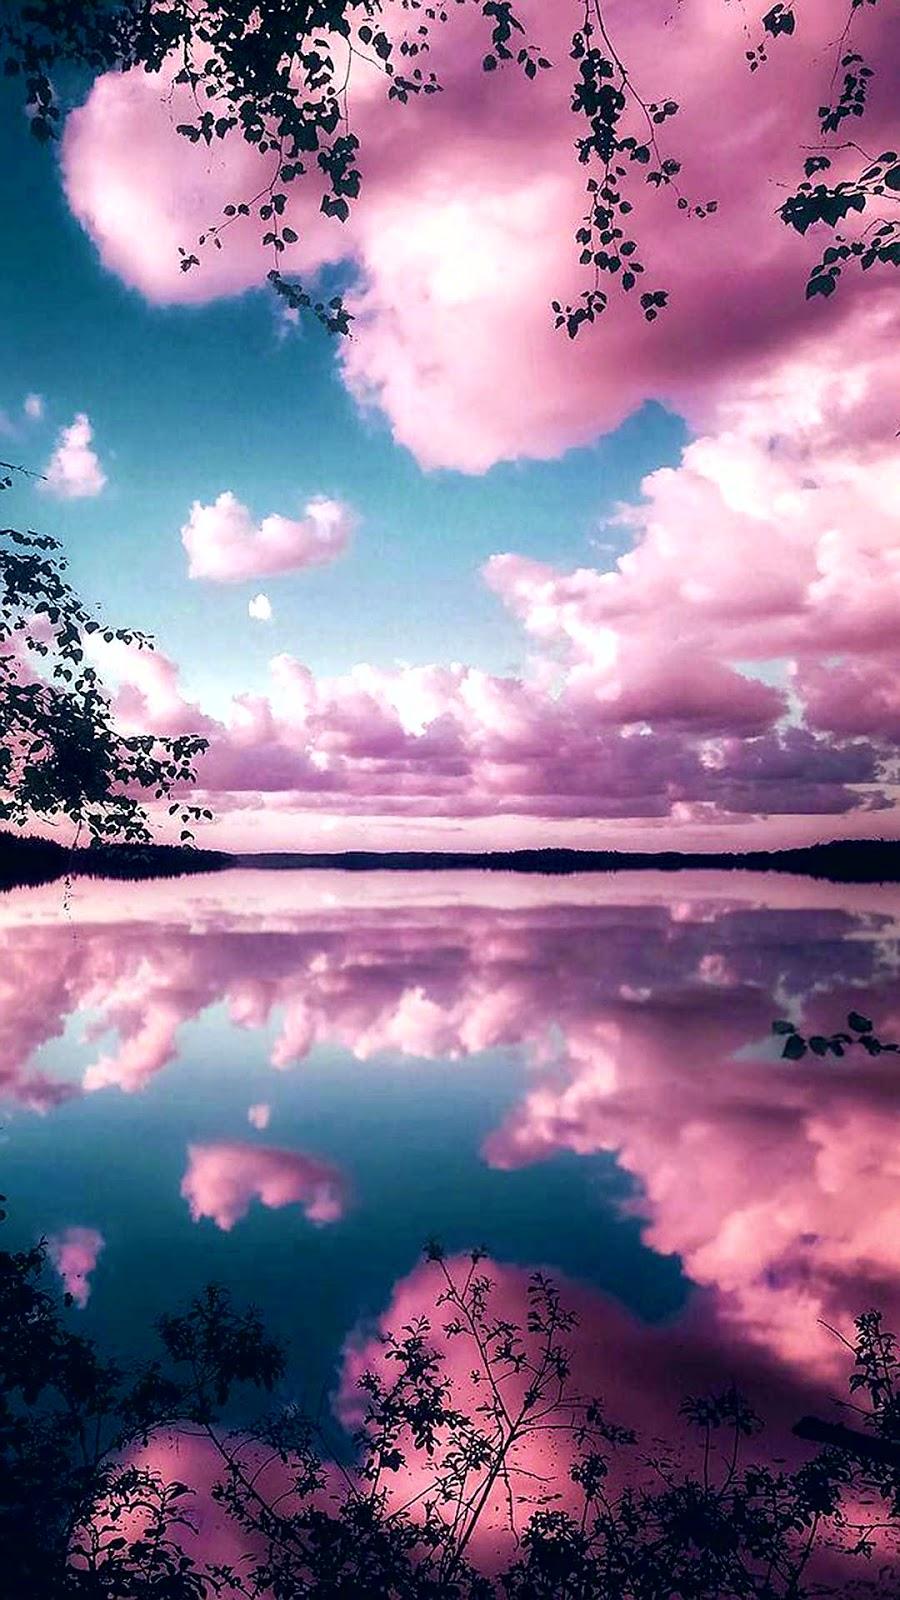 #Beautiful#Pretty#wonderful#Nature#love#Outdoors